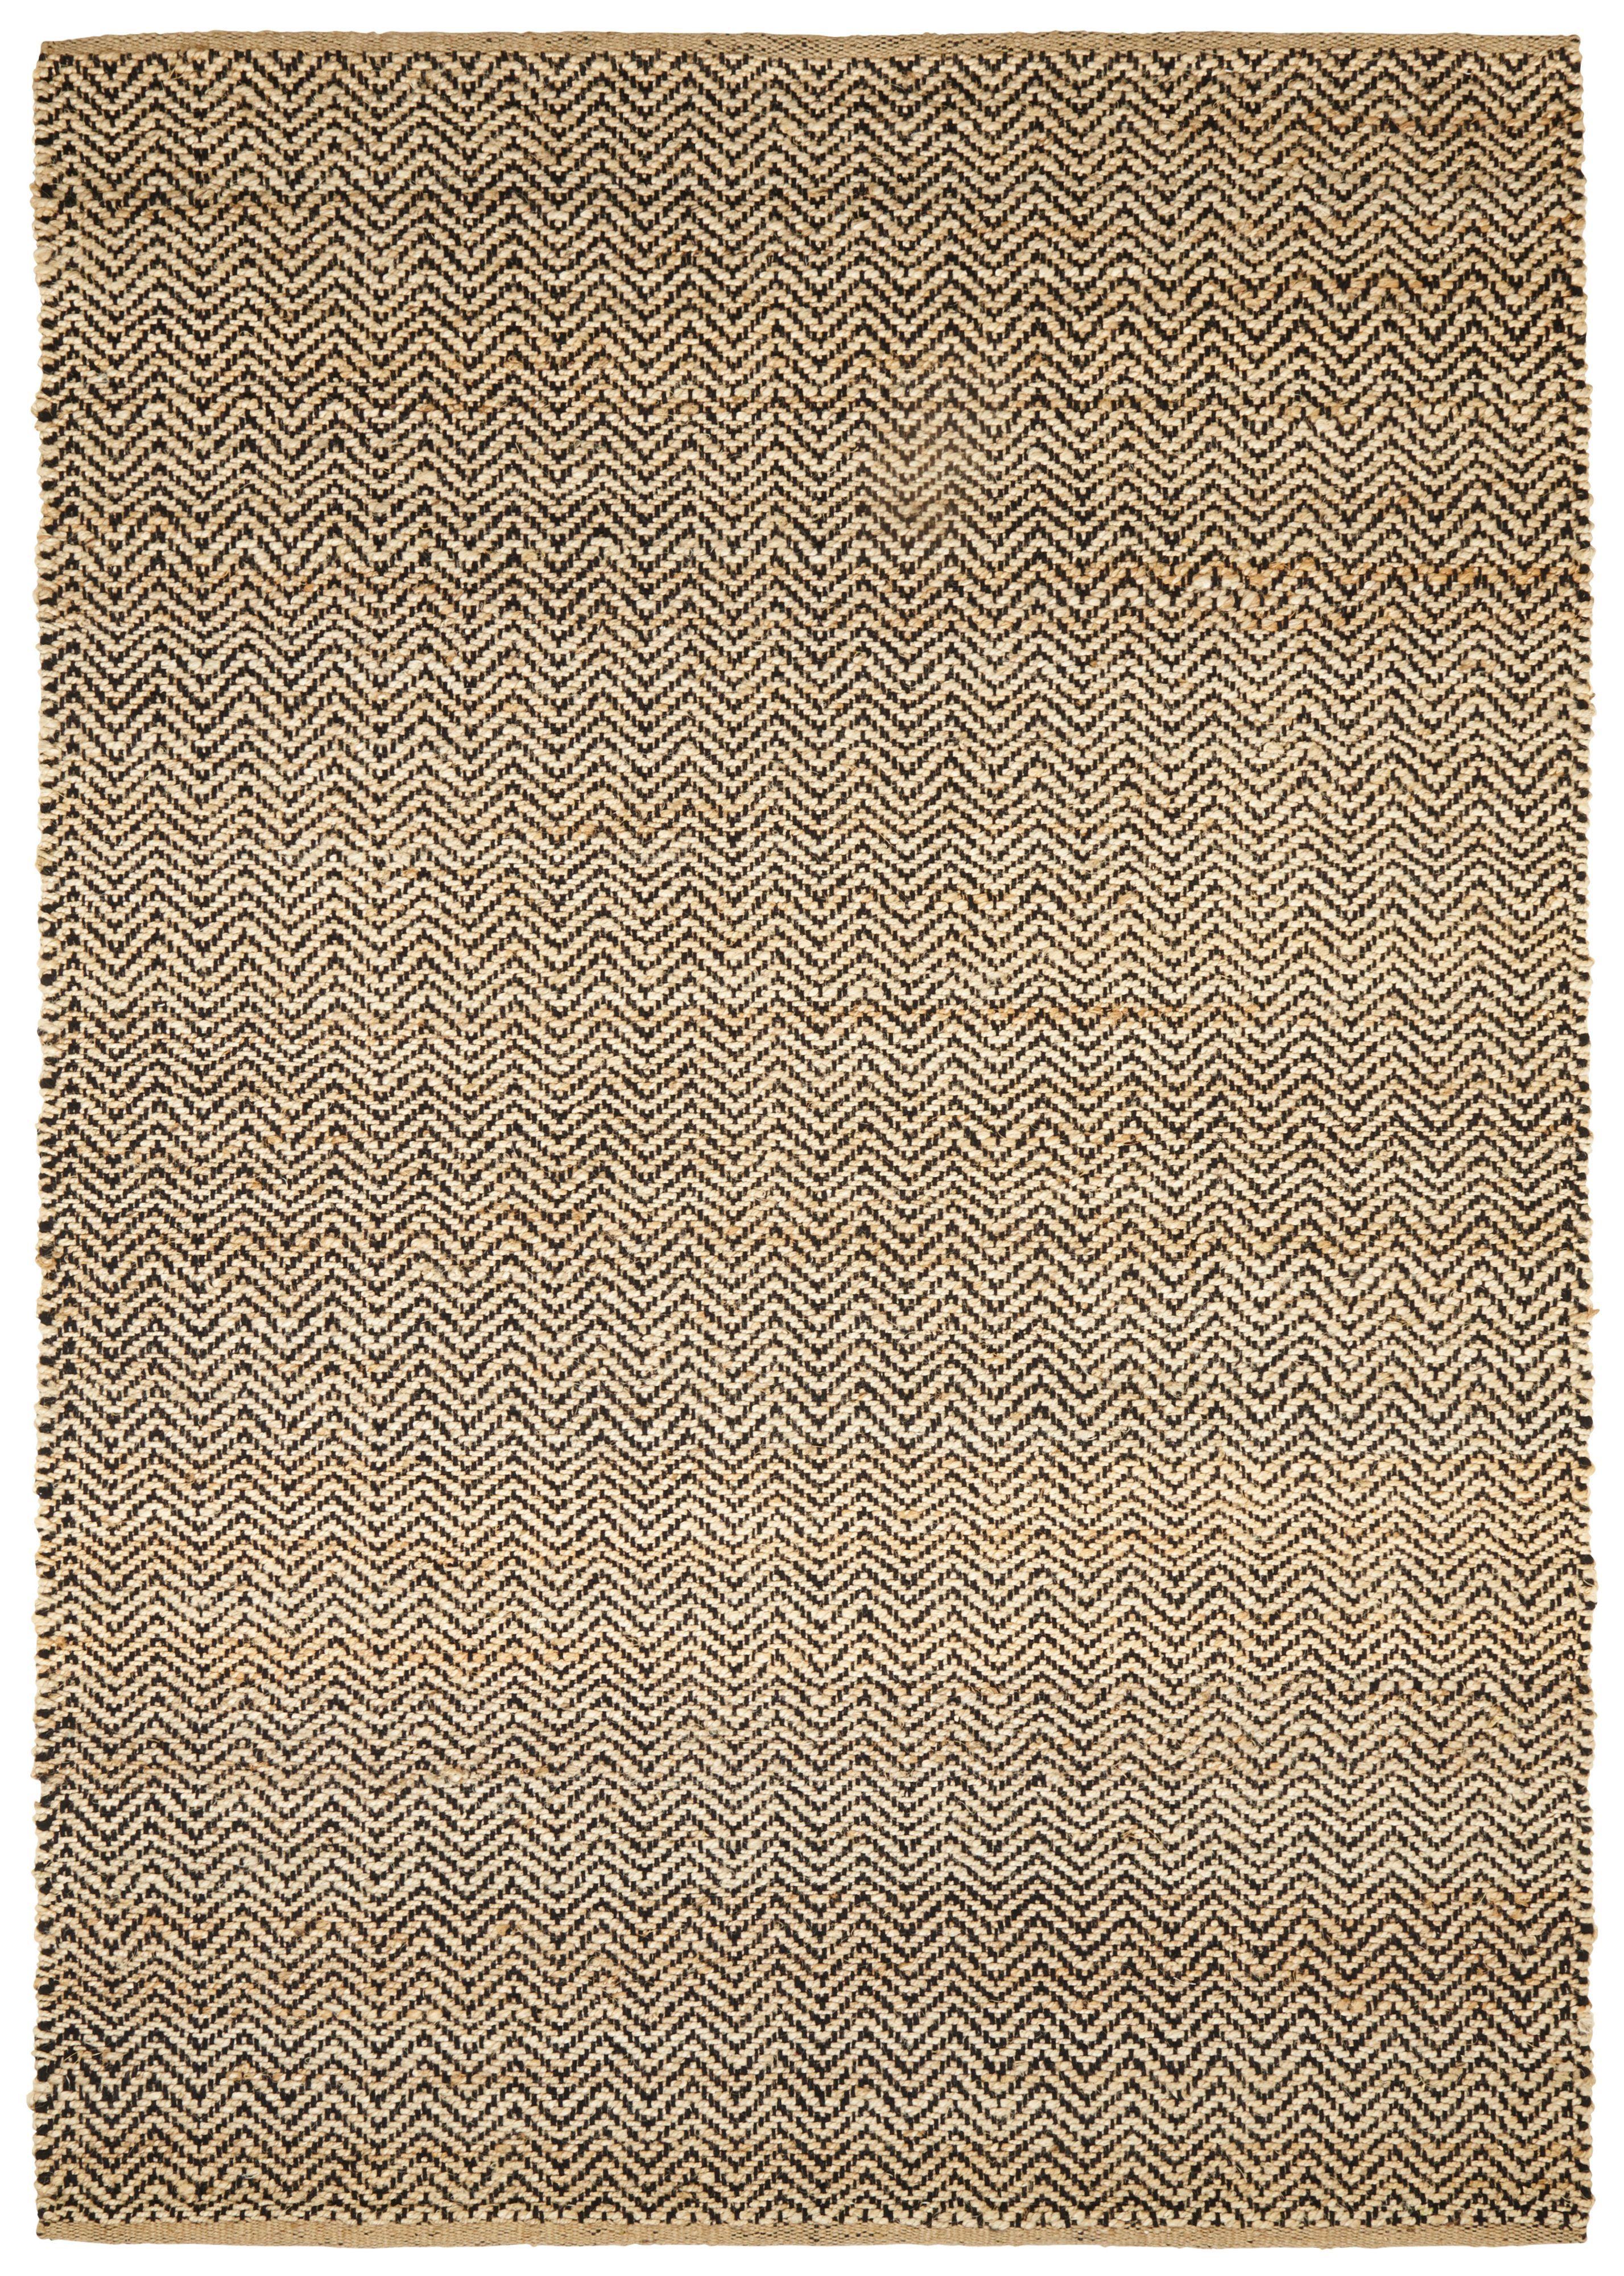 Medium rugs